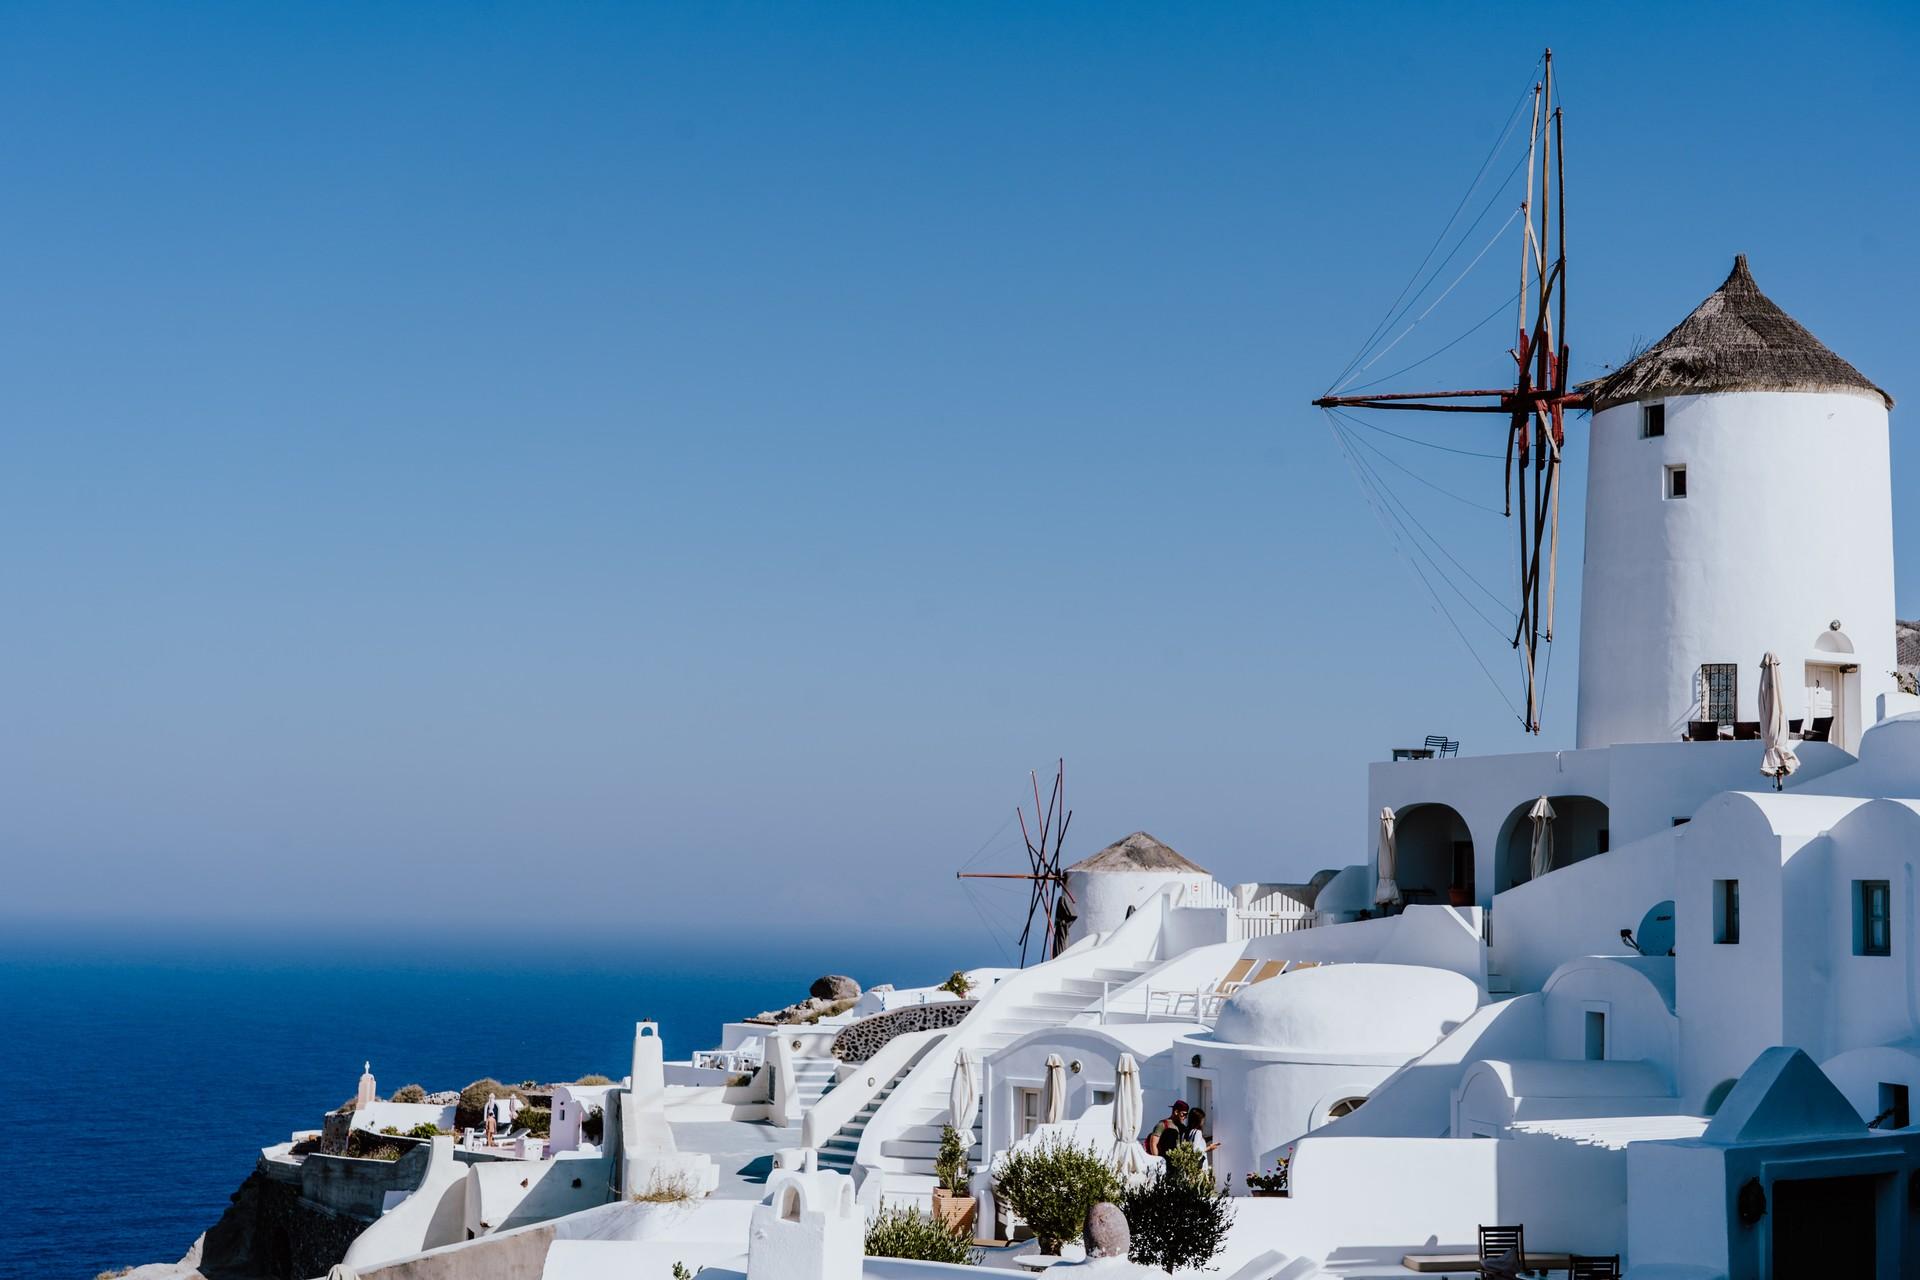 A windmill in Santorini, Greece